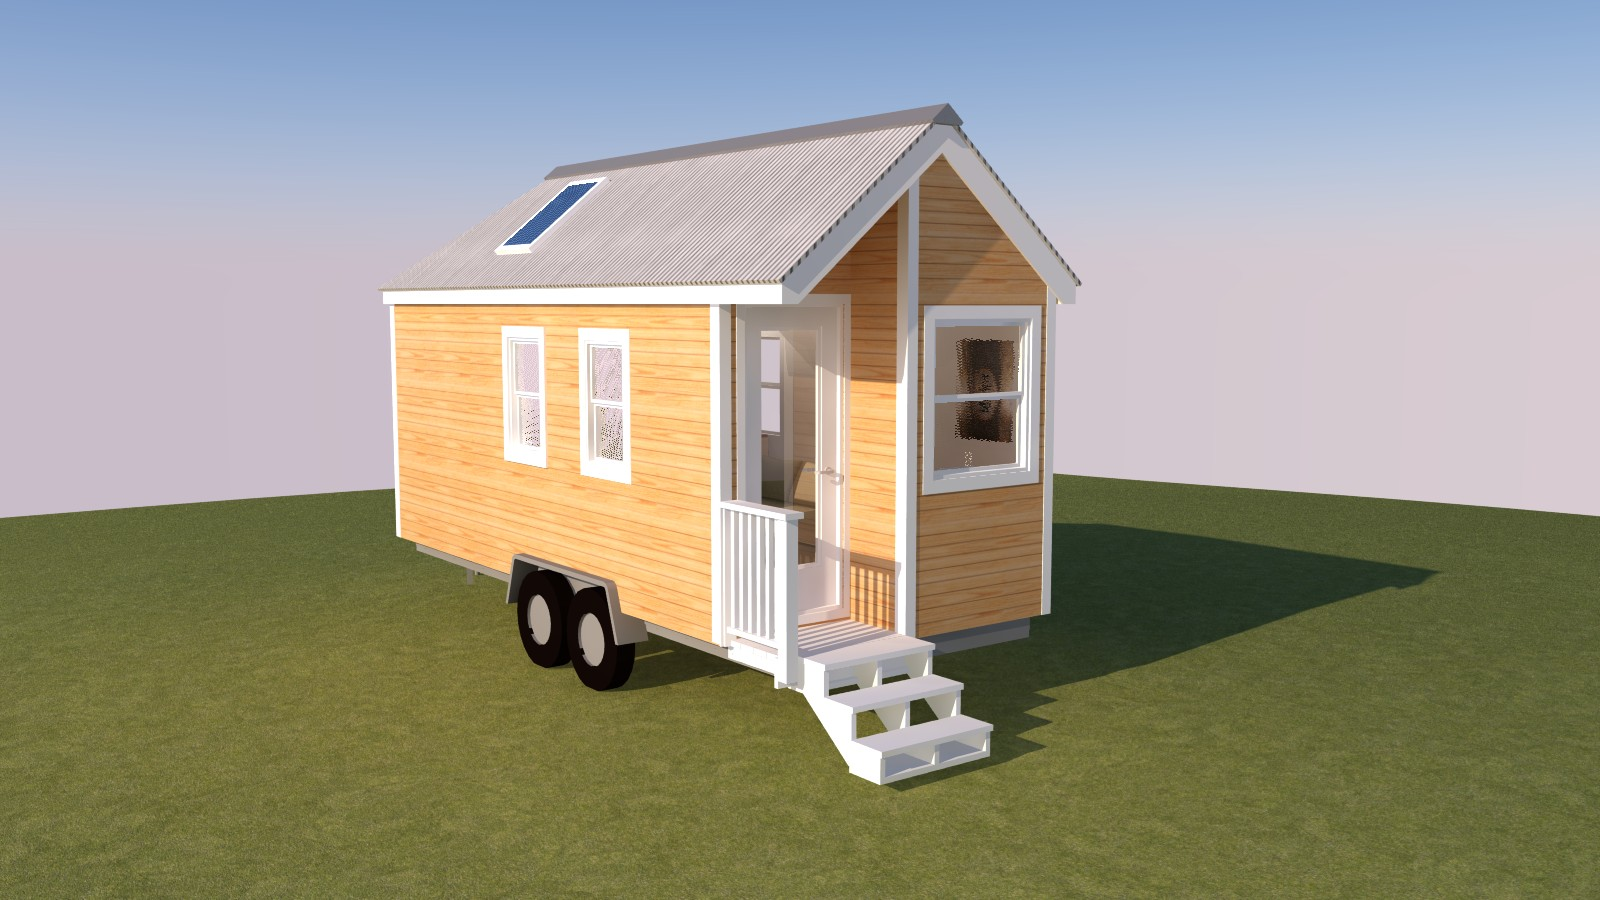 Caspar 20 tiny house plans for Small house design outside